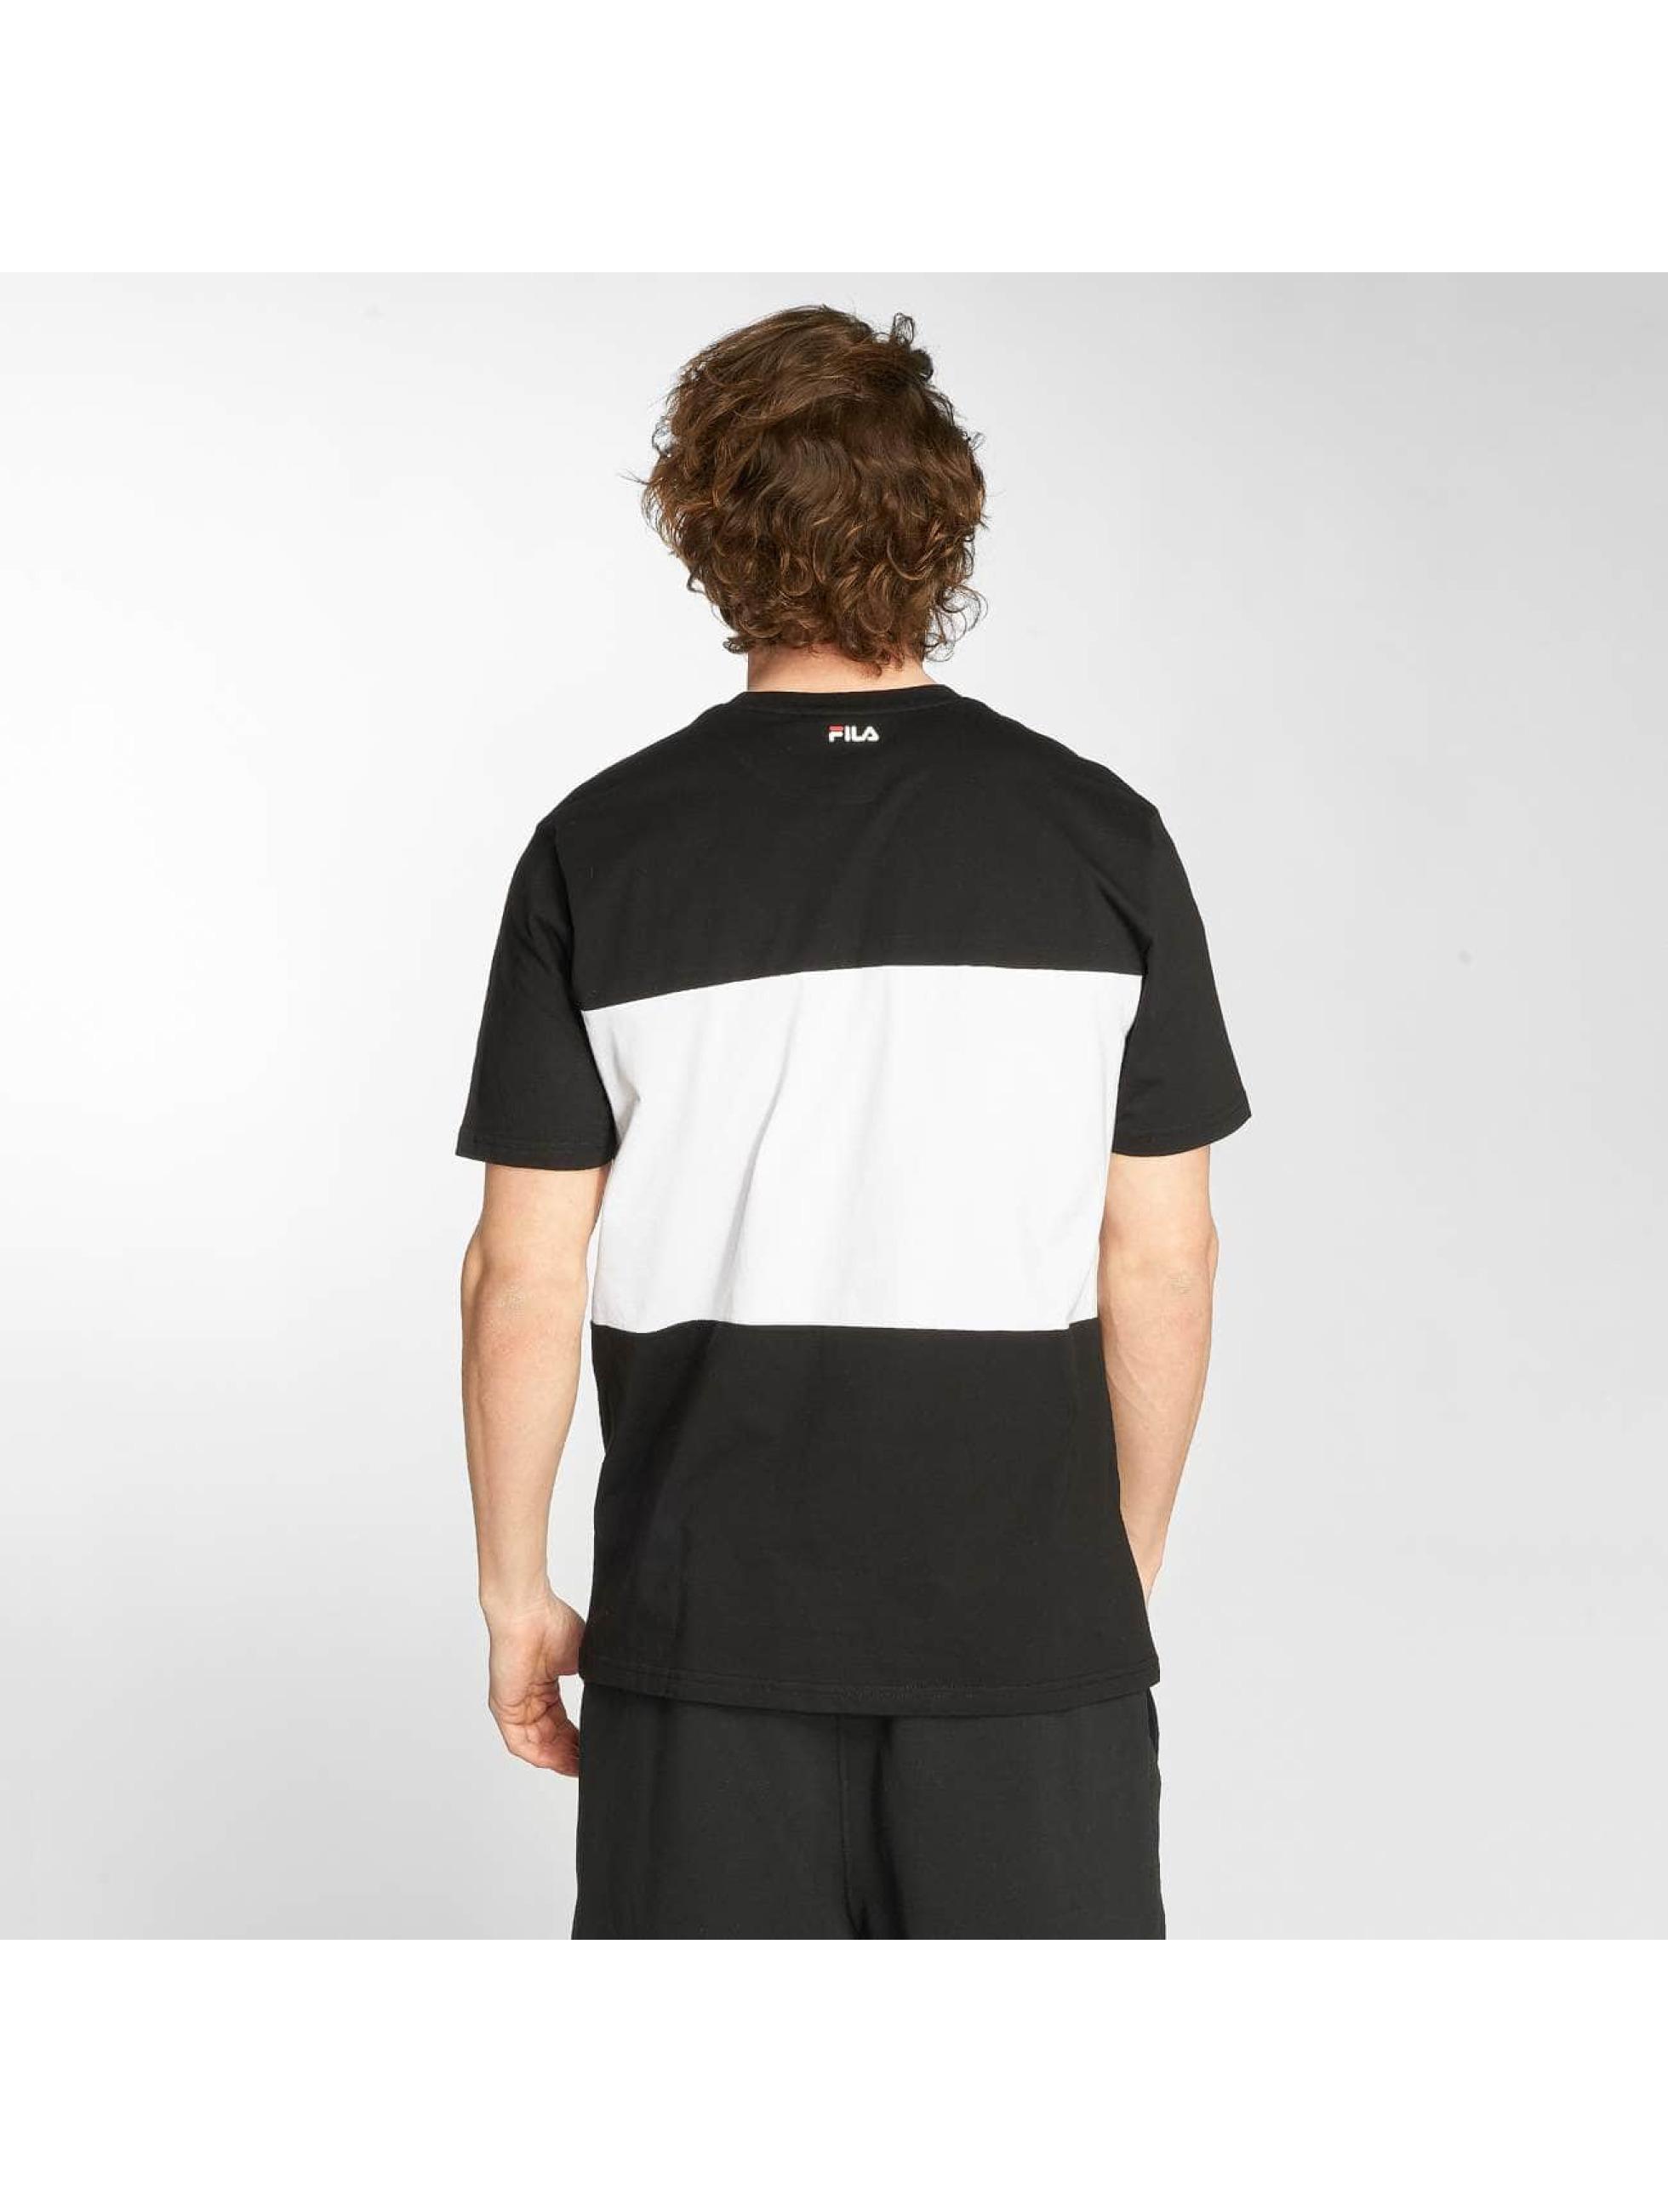 FILA t-shirt Urban Line Day zwart